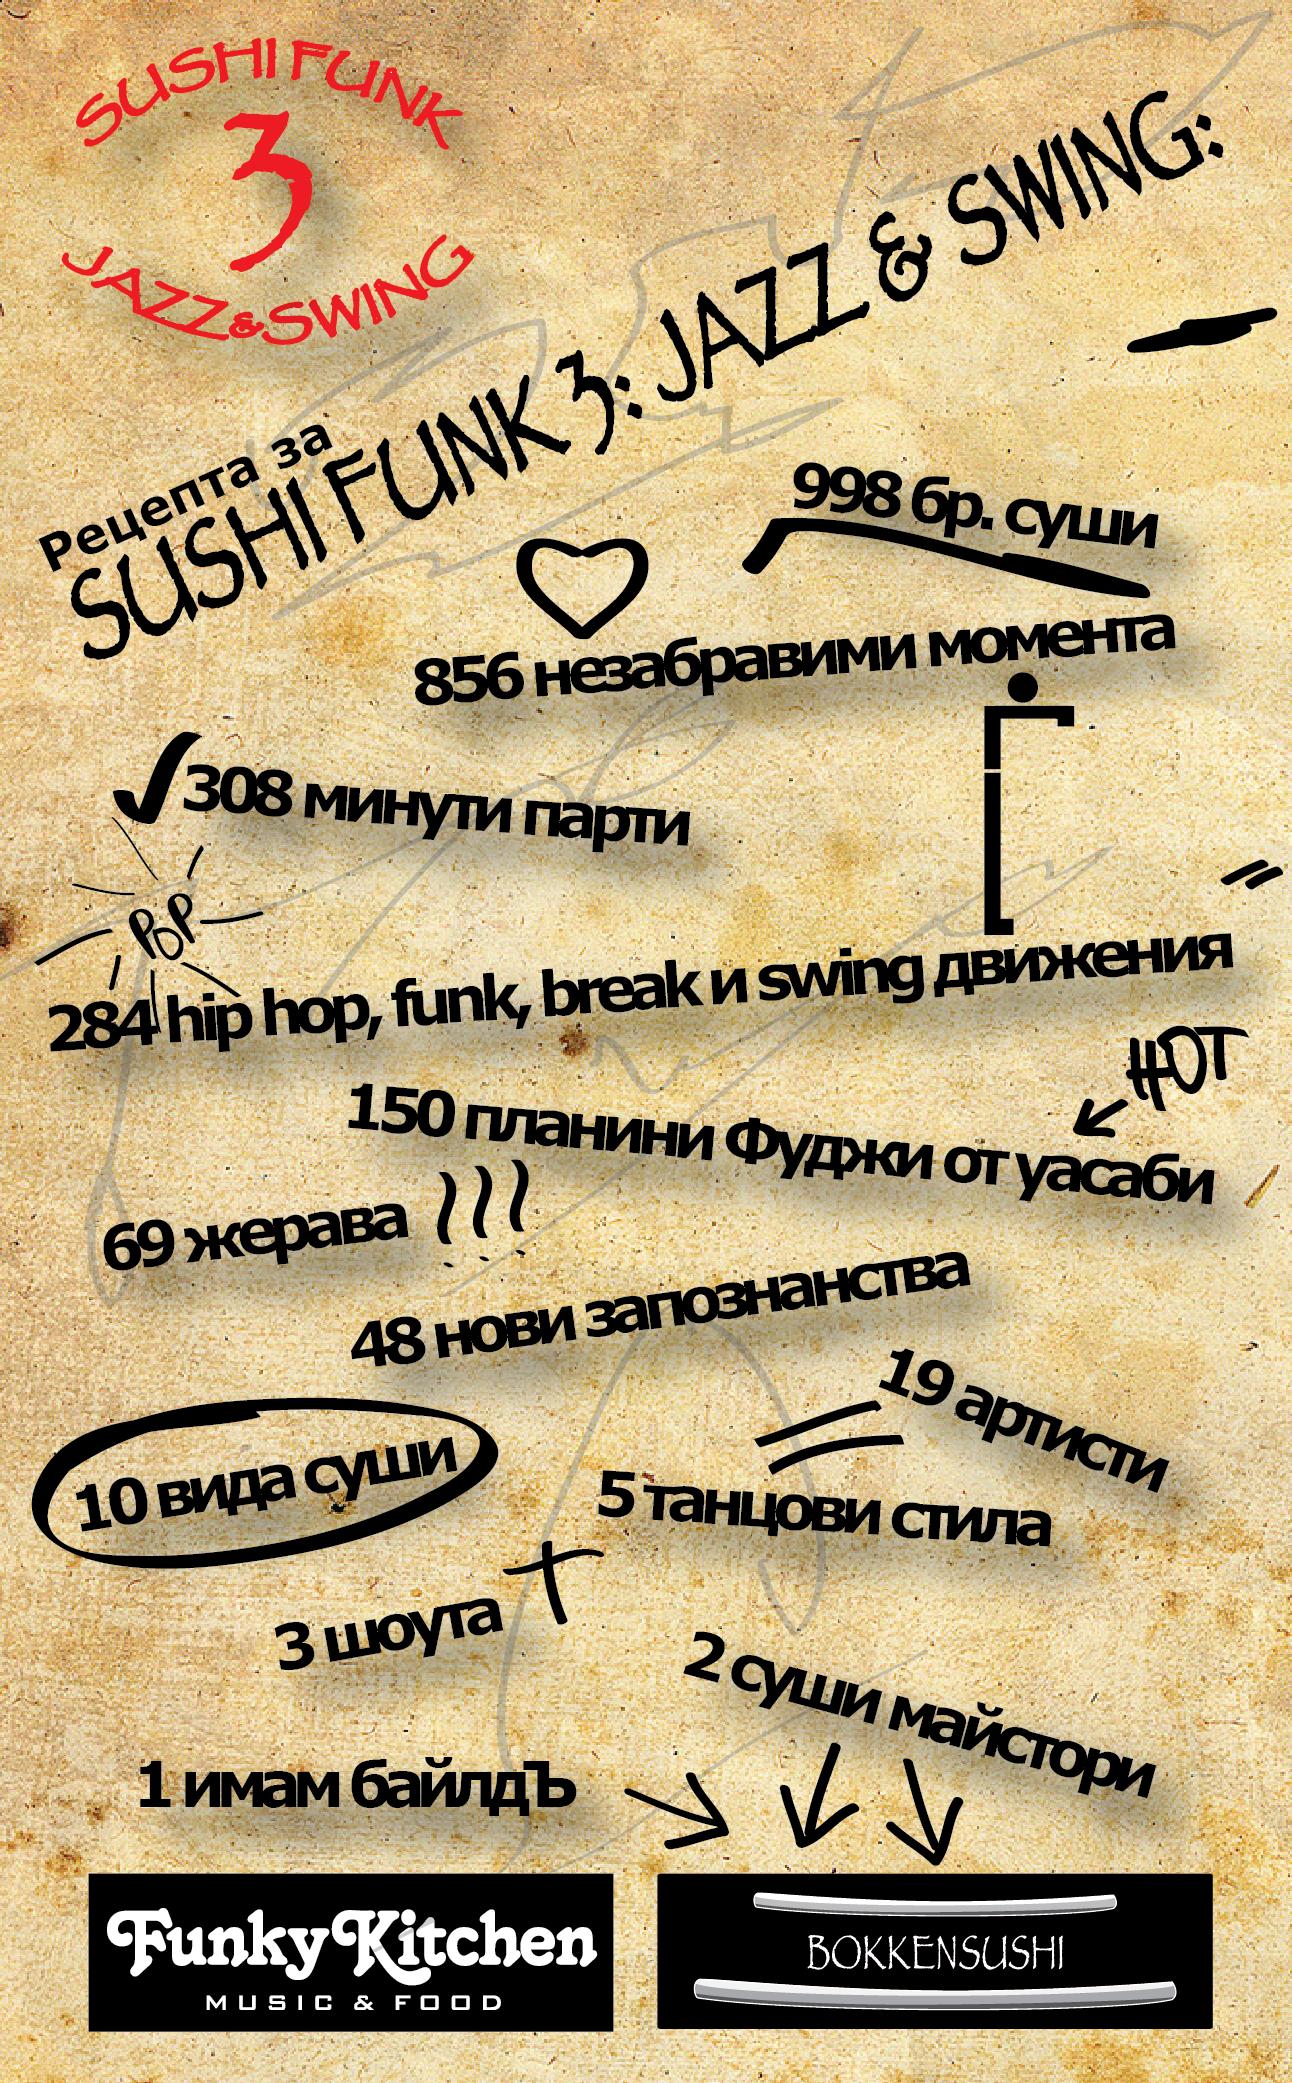 SushiFunk 3 3 back-01.png